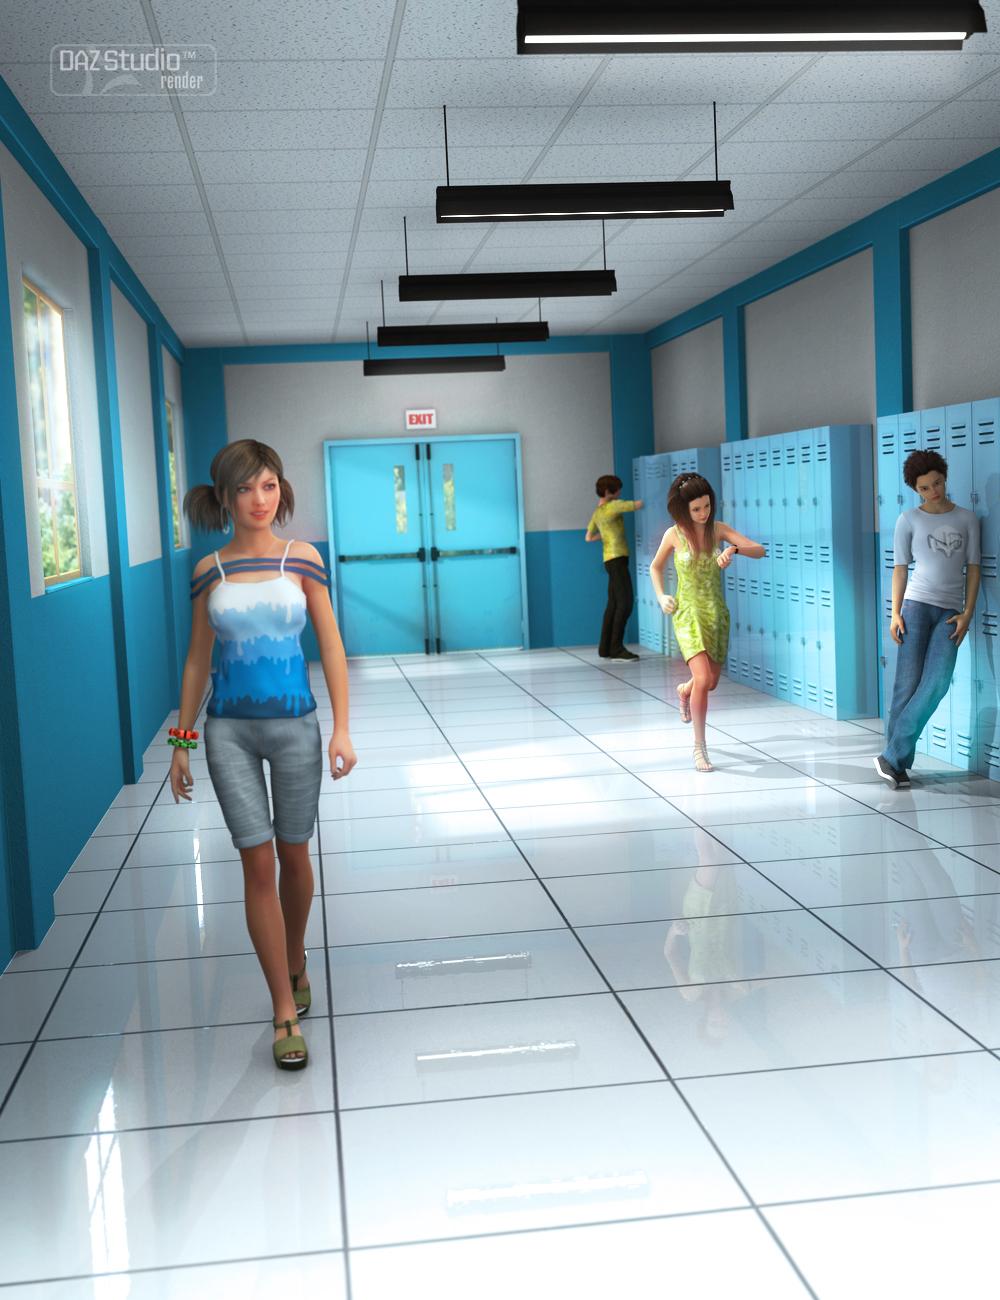 School Hallway by: , 3D Models by Daz 3D